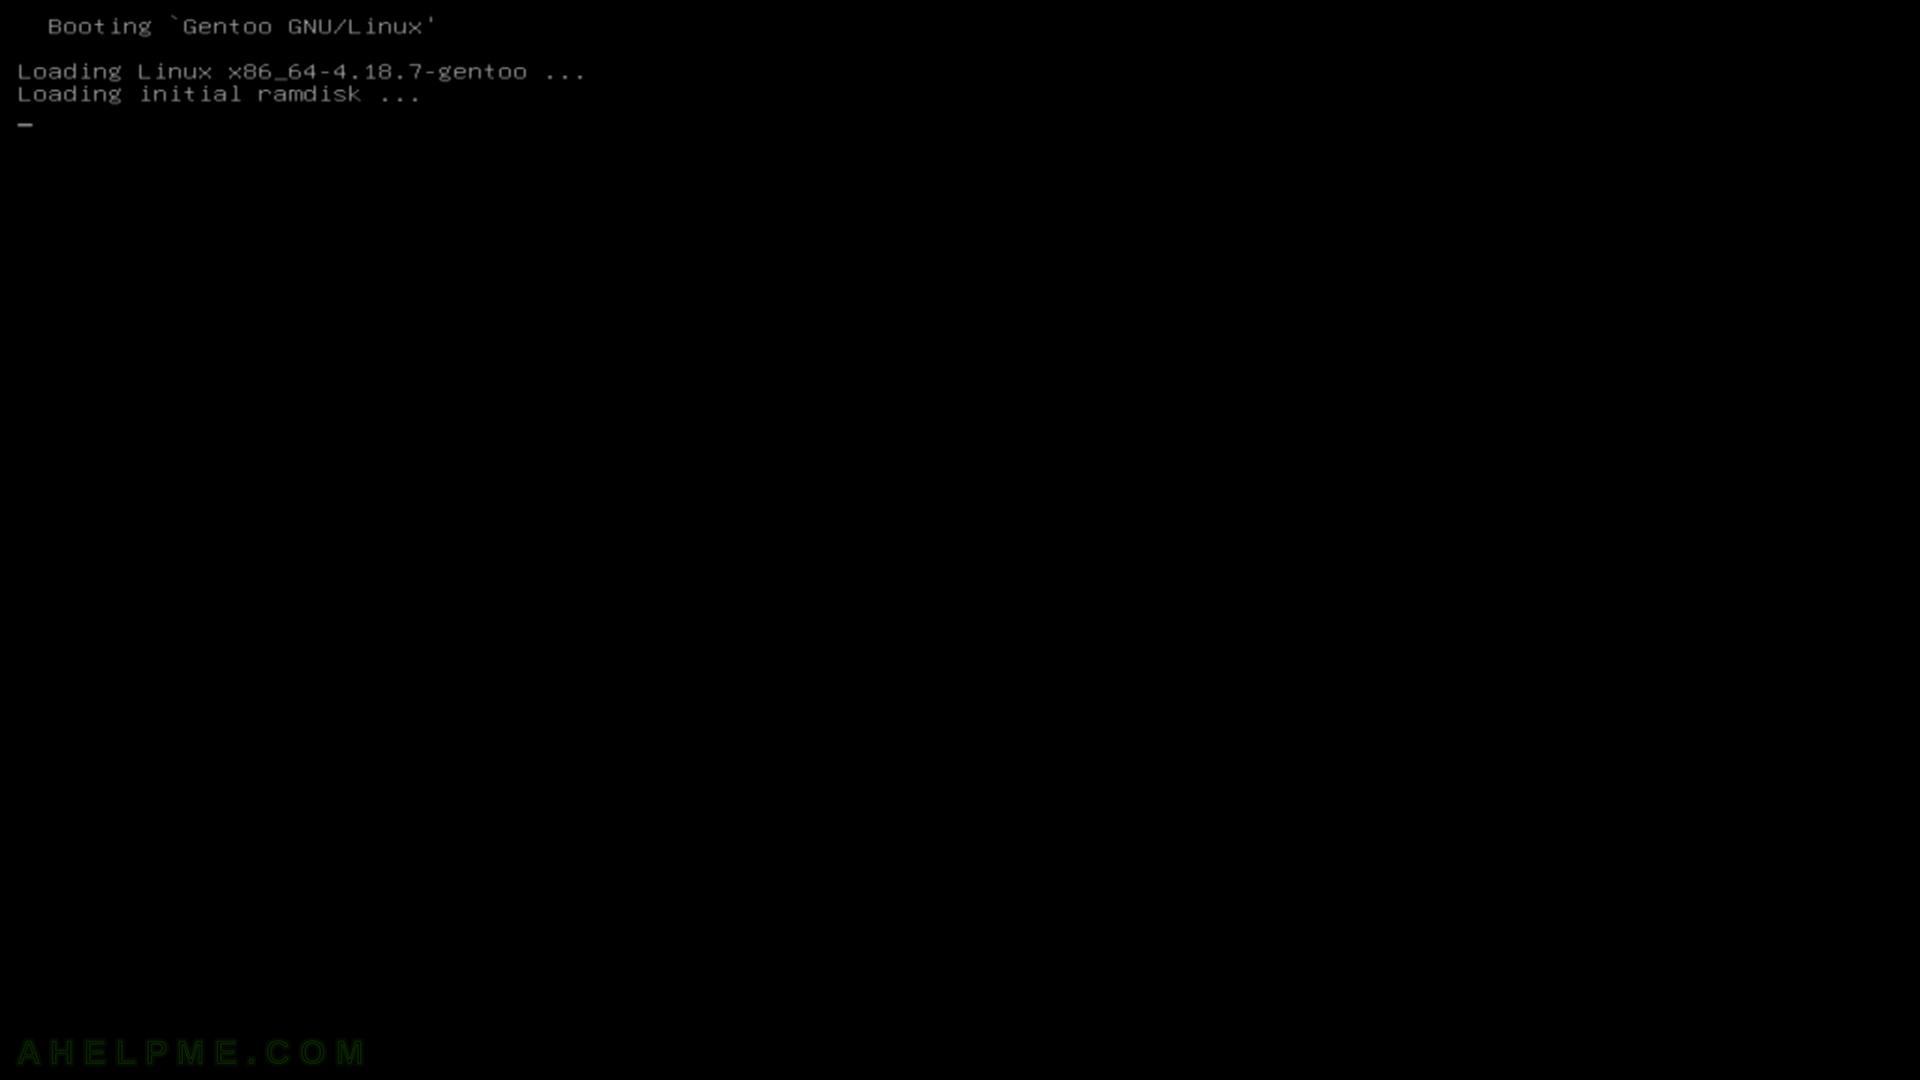 Gentoo Minimal Installation CD (amd64 aka x86_64) – booting (in UEFI